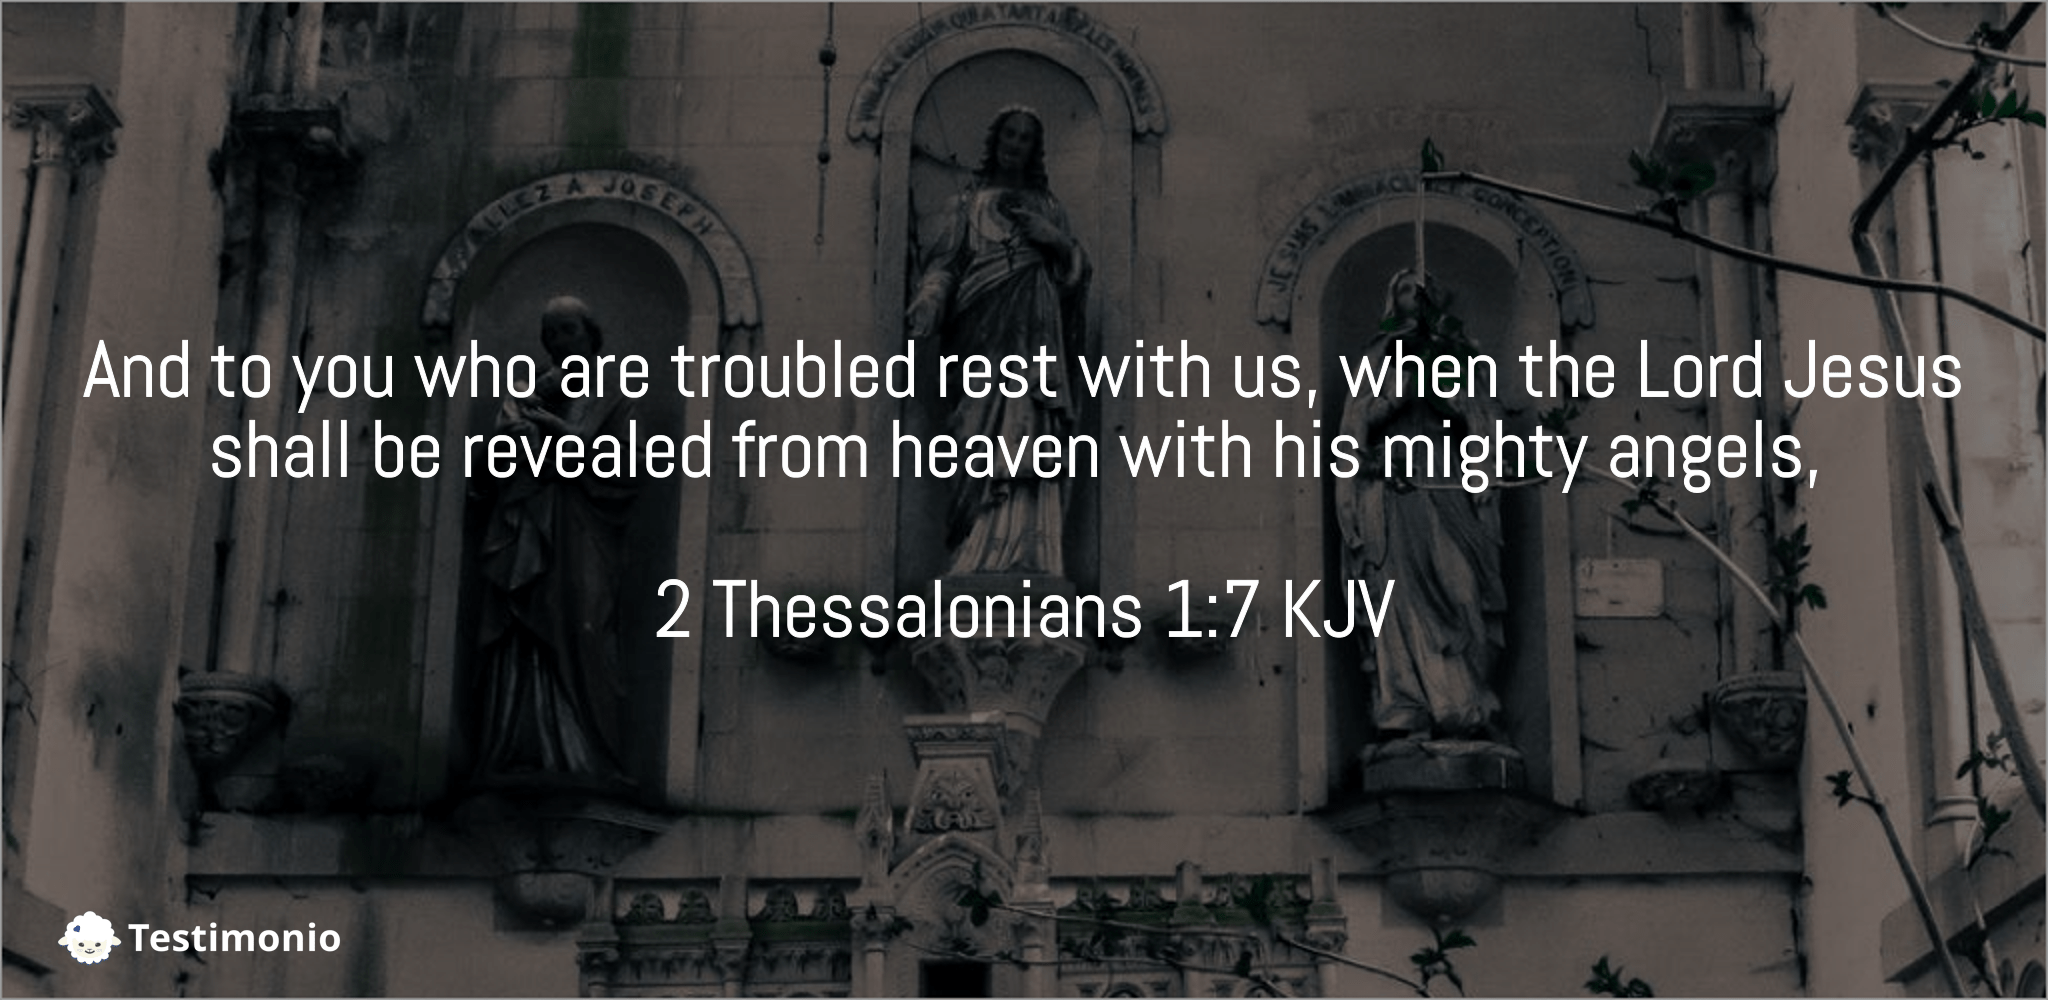 2 Thessalonians 1:7